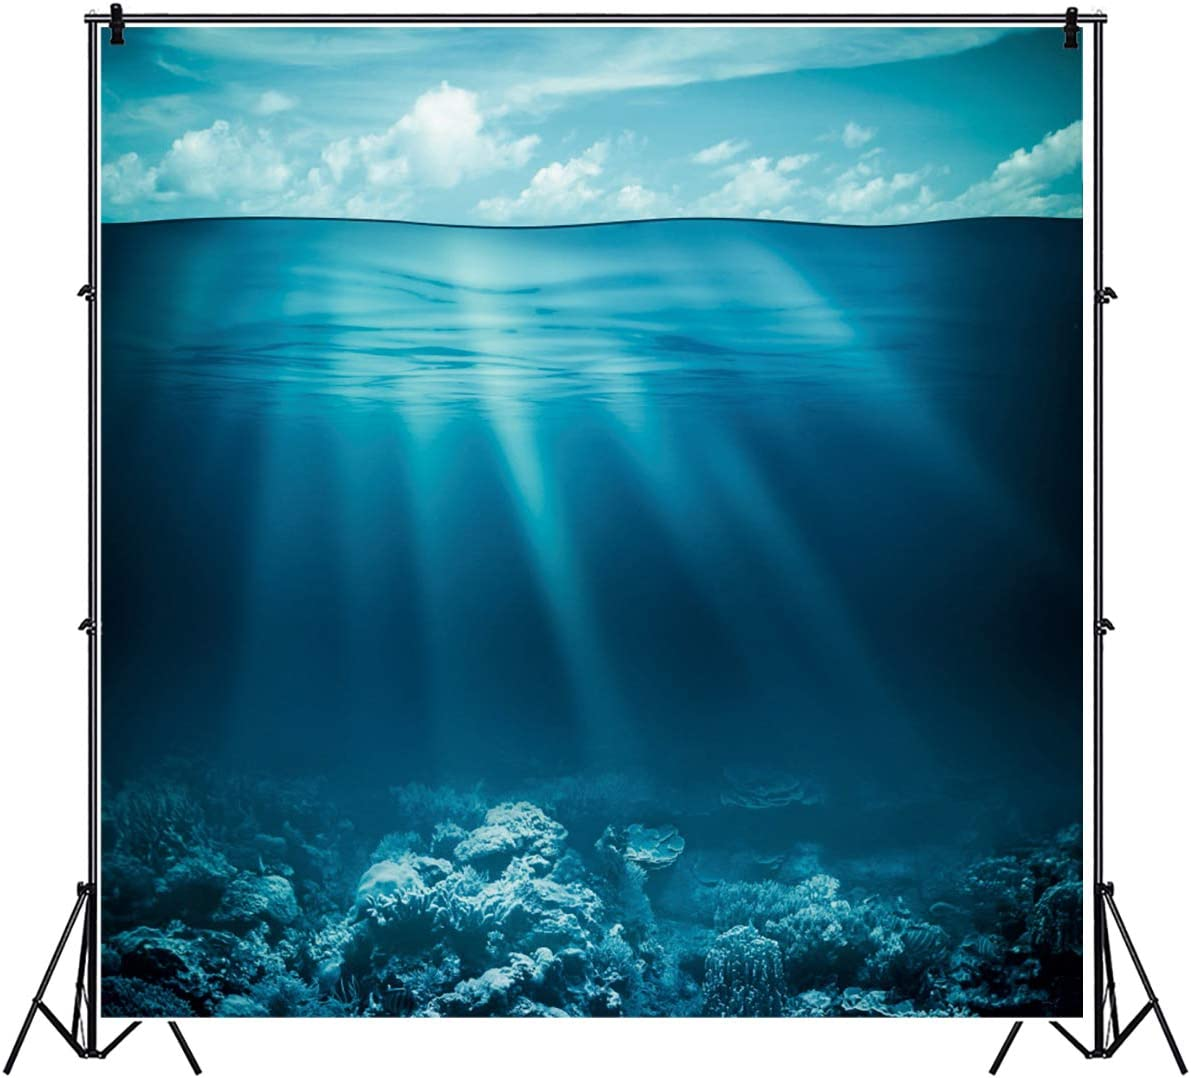 YEELE 10x10ft Deep Sea Blue Water Backdrop Under The Sea Theme Photography Background Summer Birthday Hawaiian Marine Life YouTube Videos Kids Adults Portrait Photobooth Props Wallpaper